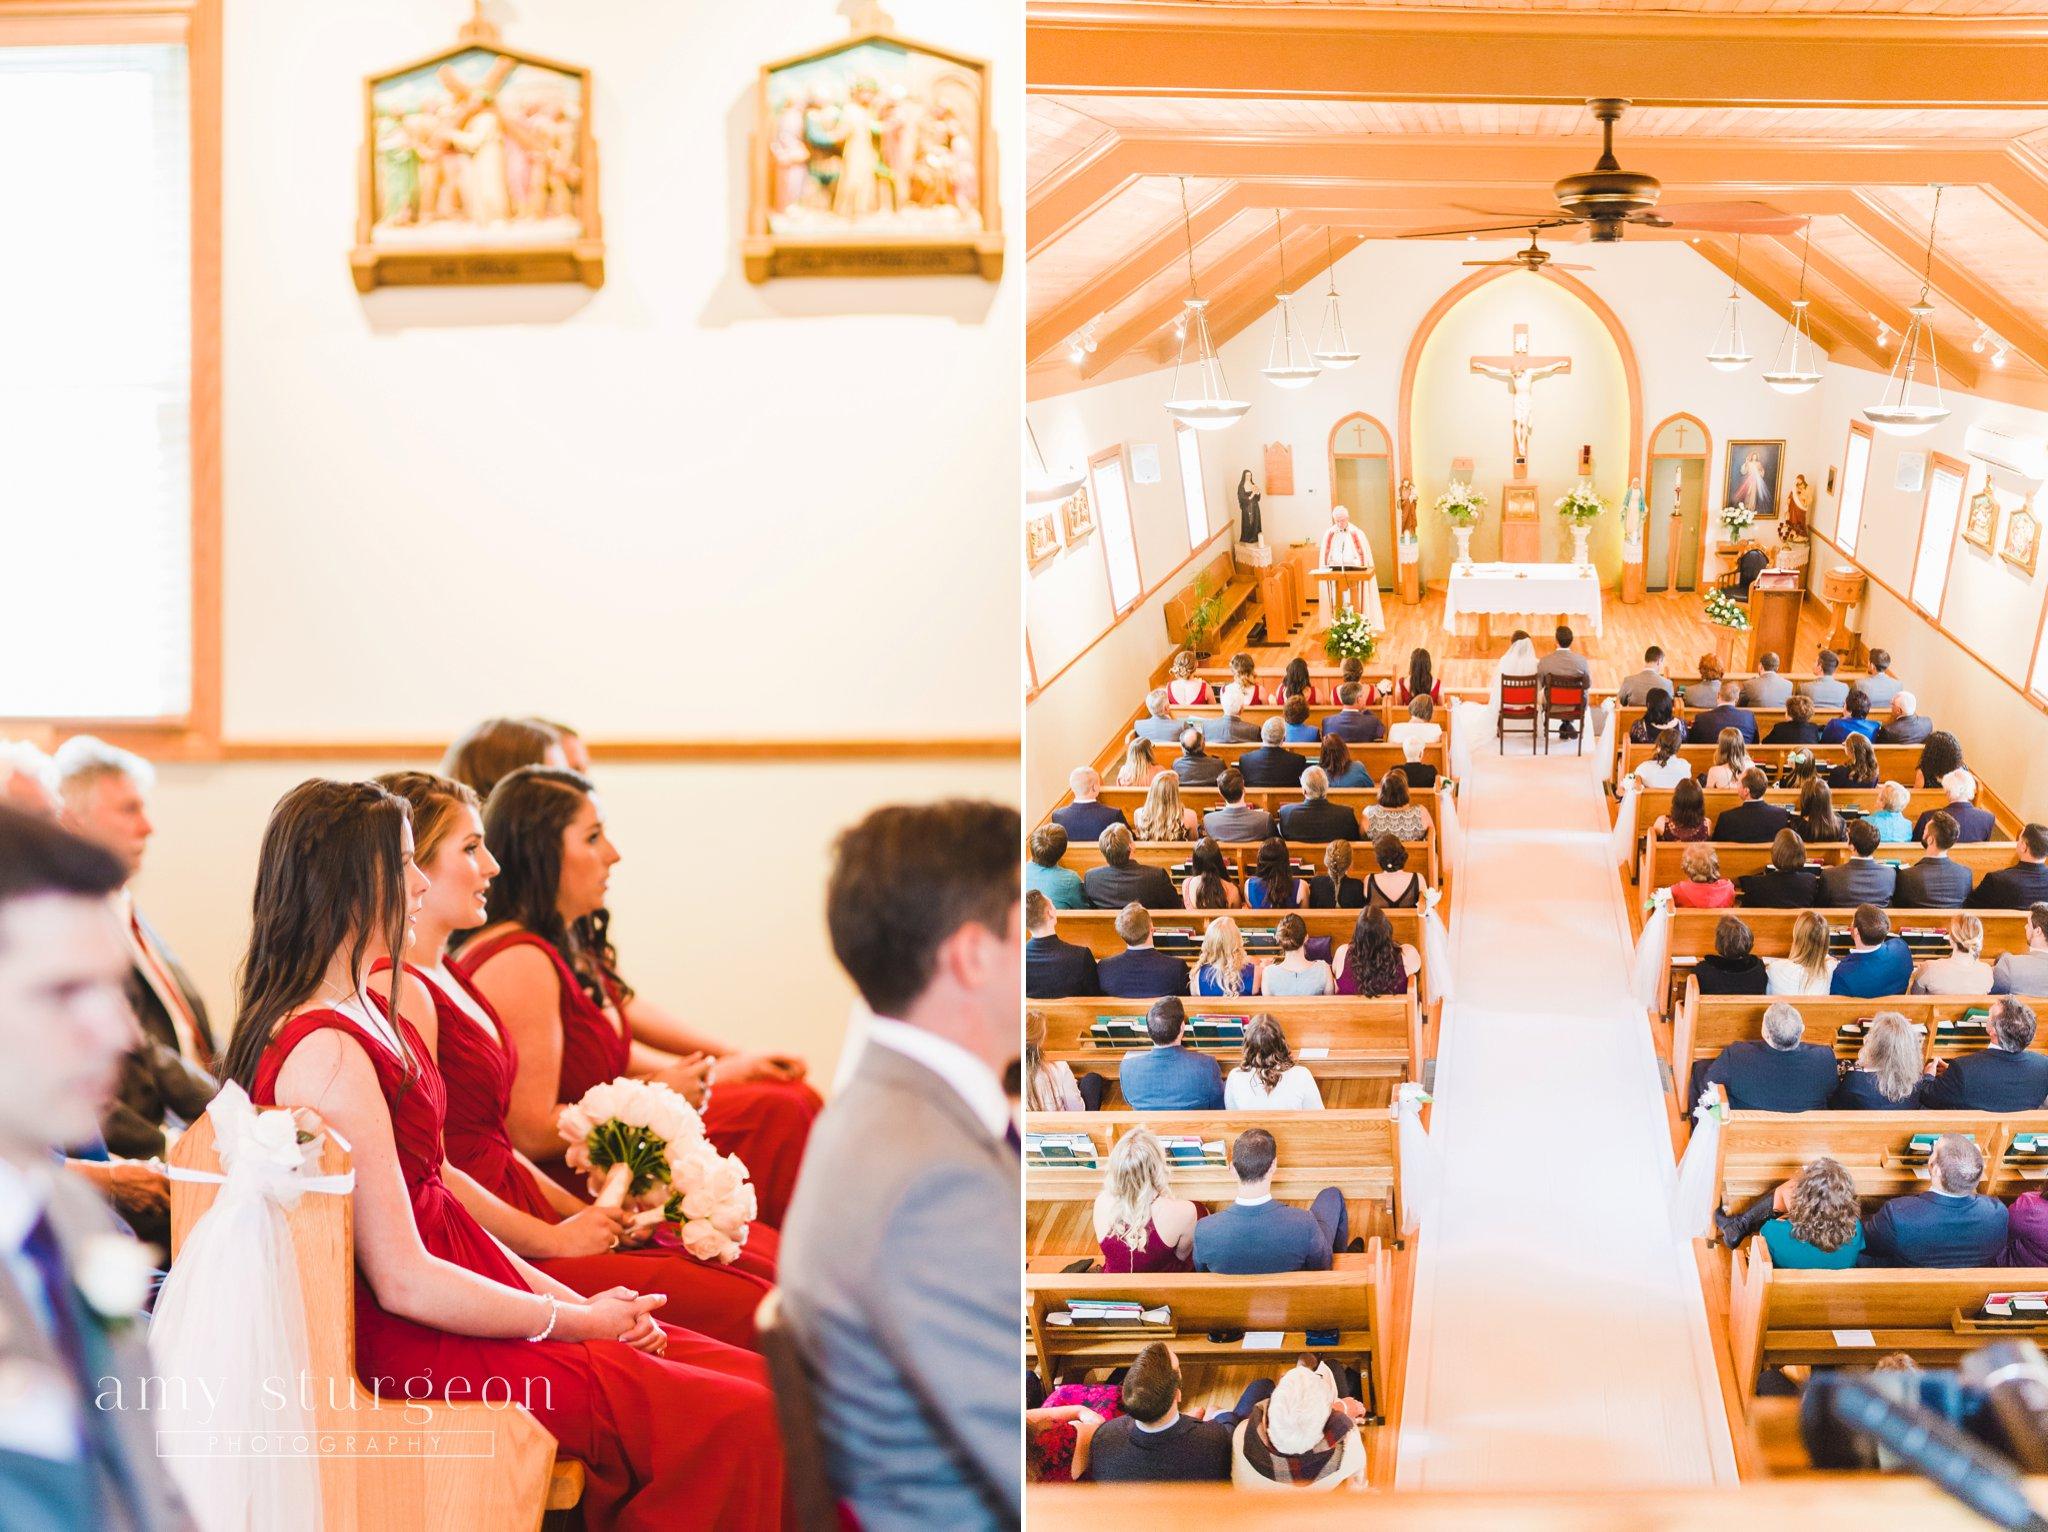 St. margaret mary catholic church wedding ceremony at the alpaca farm wedding